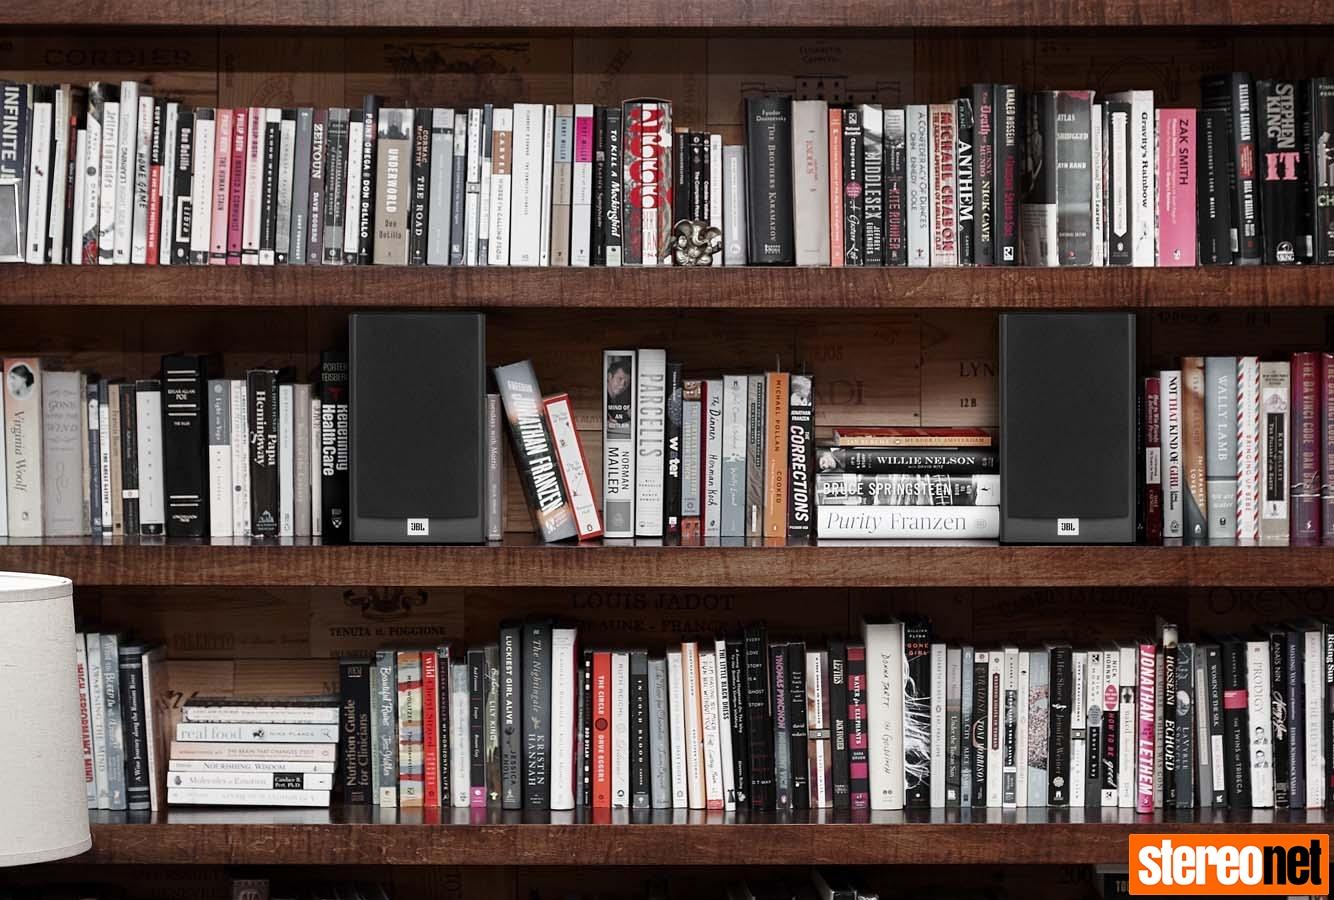 Jbl Stage Bookshelf 1 Large Full 20 Nov 2018 0100 580k